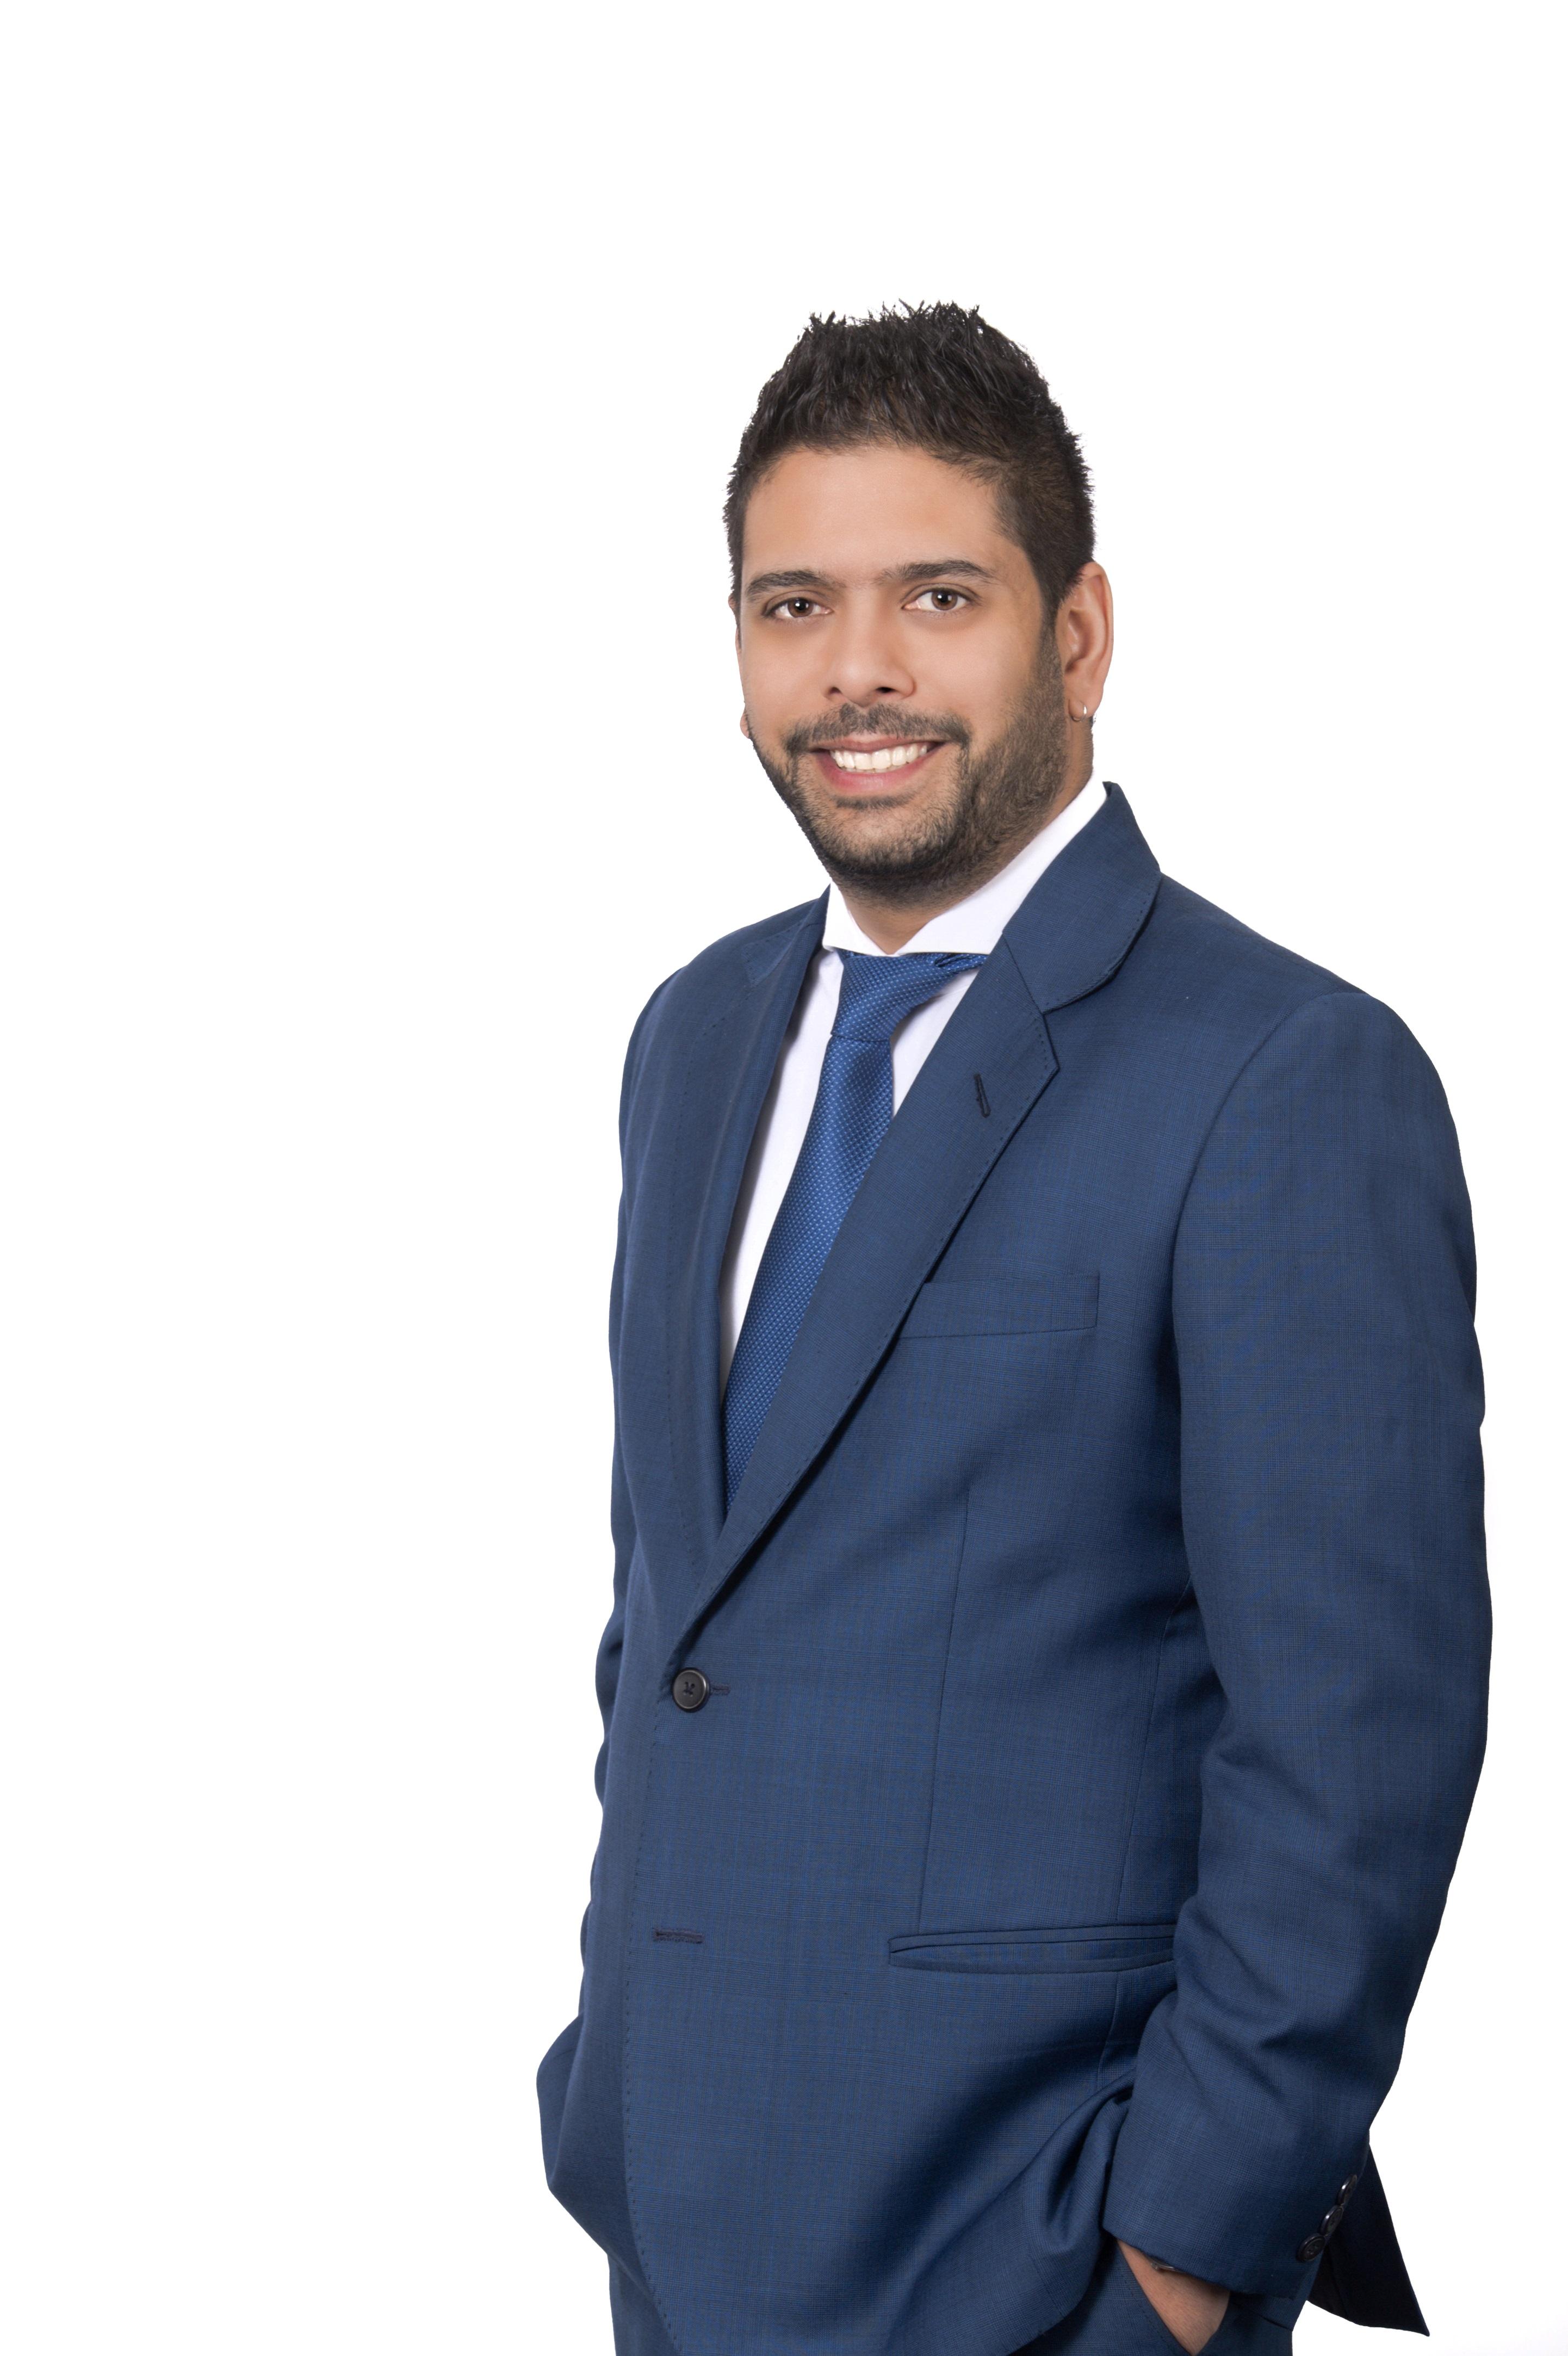 Adrit Raha, CEO, Vivant